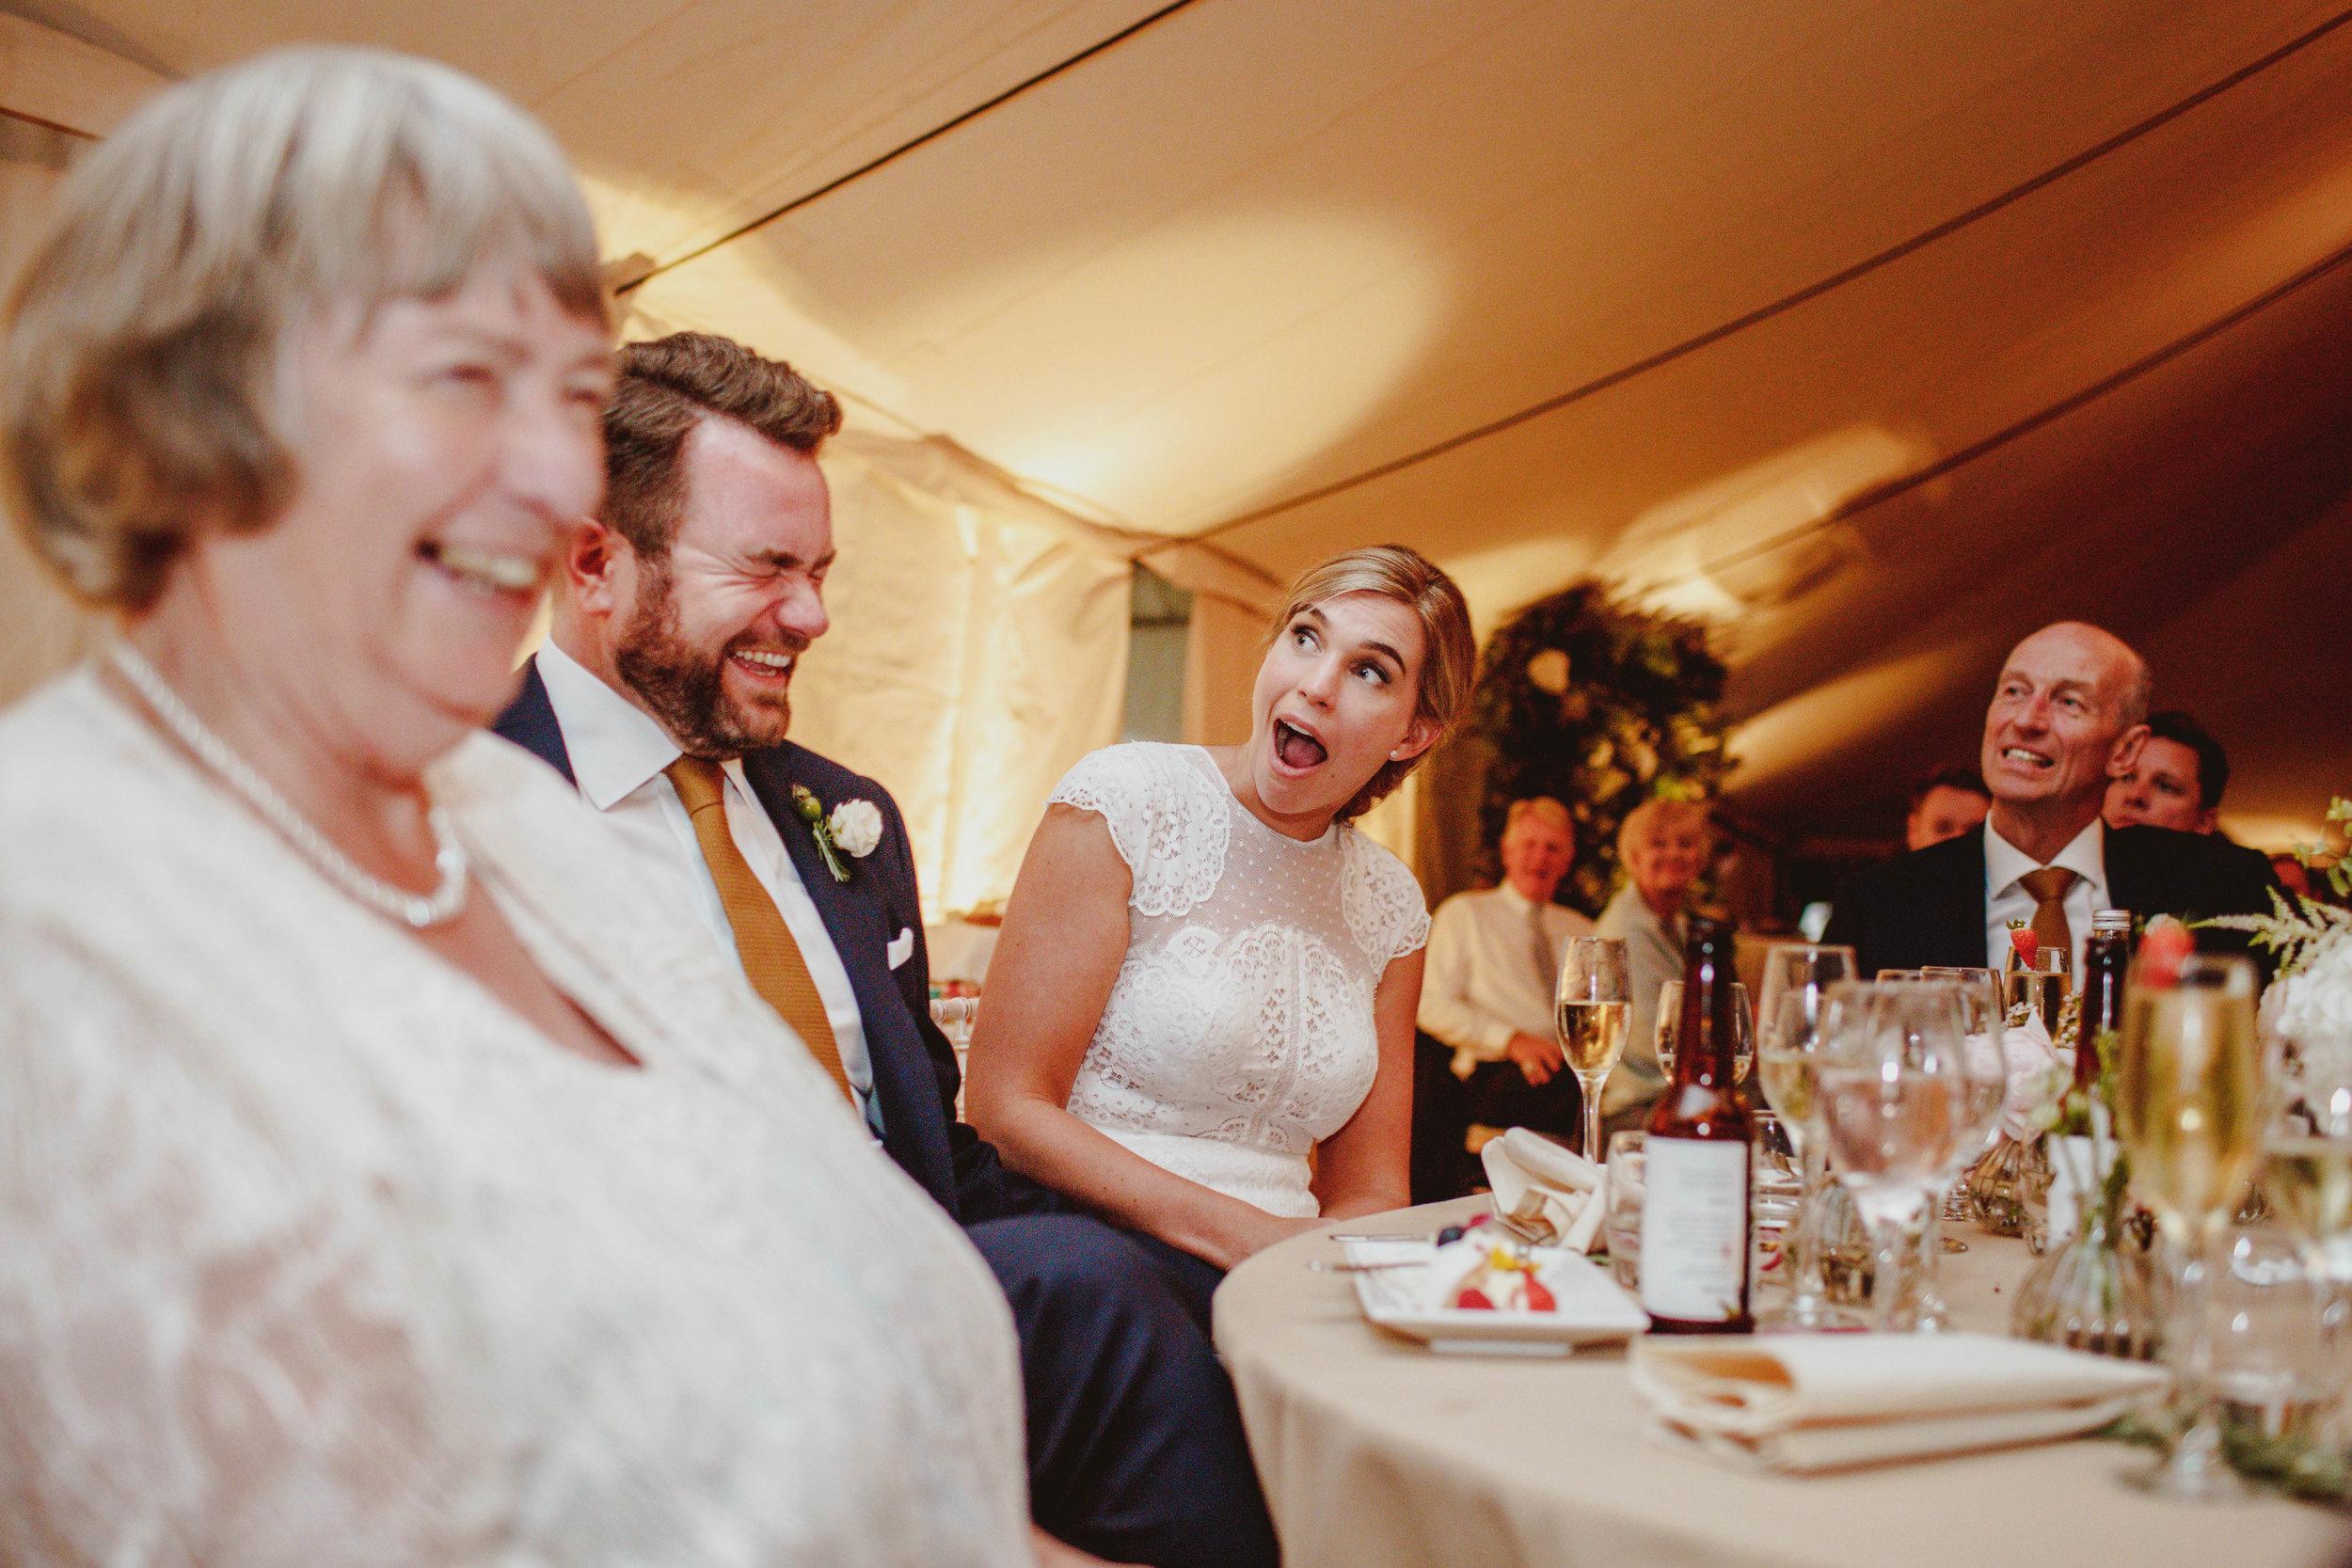 Surrey-wedding-photography-52.jpg